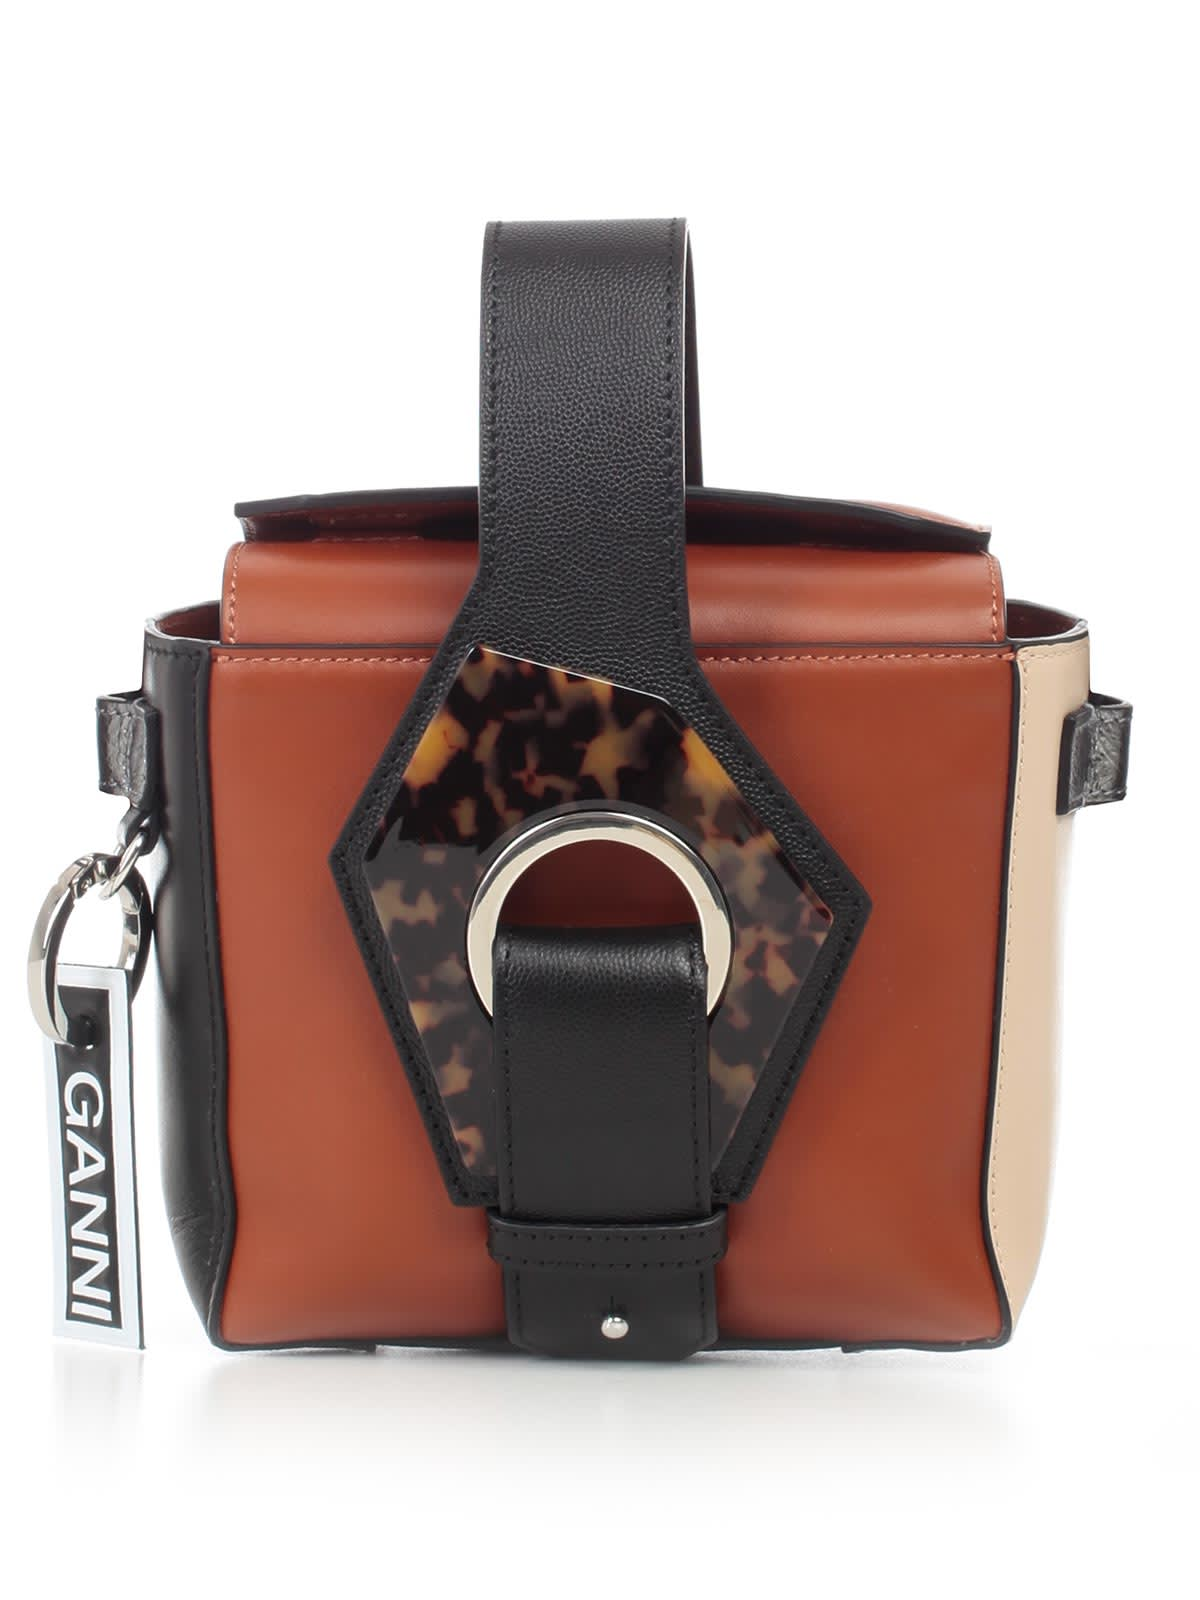 Ganni Bag Leather Satchel